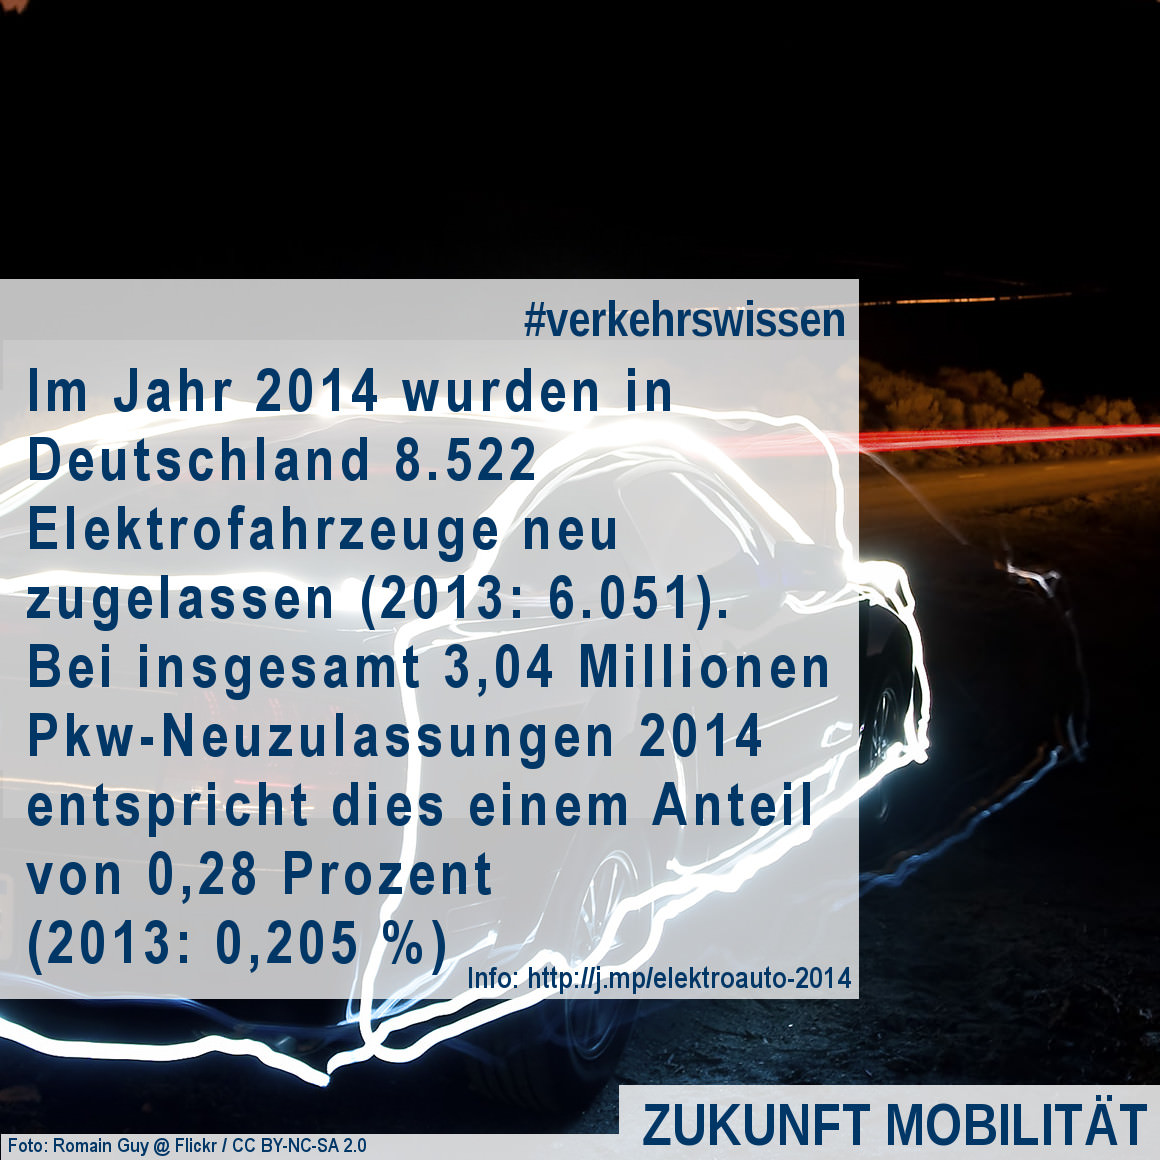 [Verkehrswissen kompakt] Neuzugelassene Elektrofahrzeuge im Jahr 2014